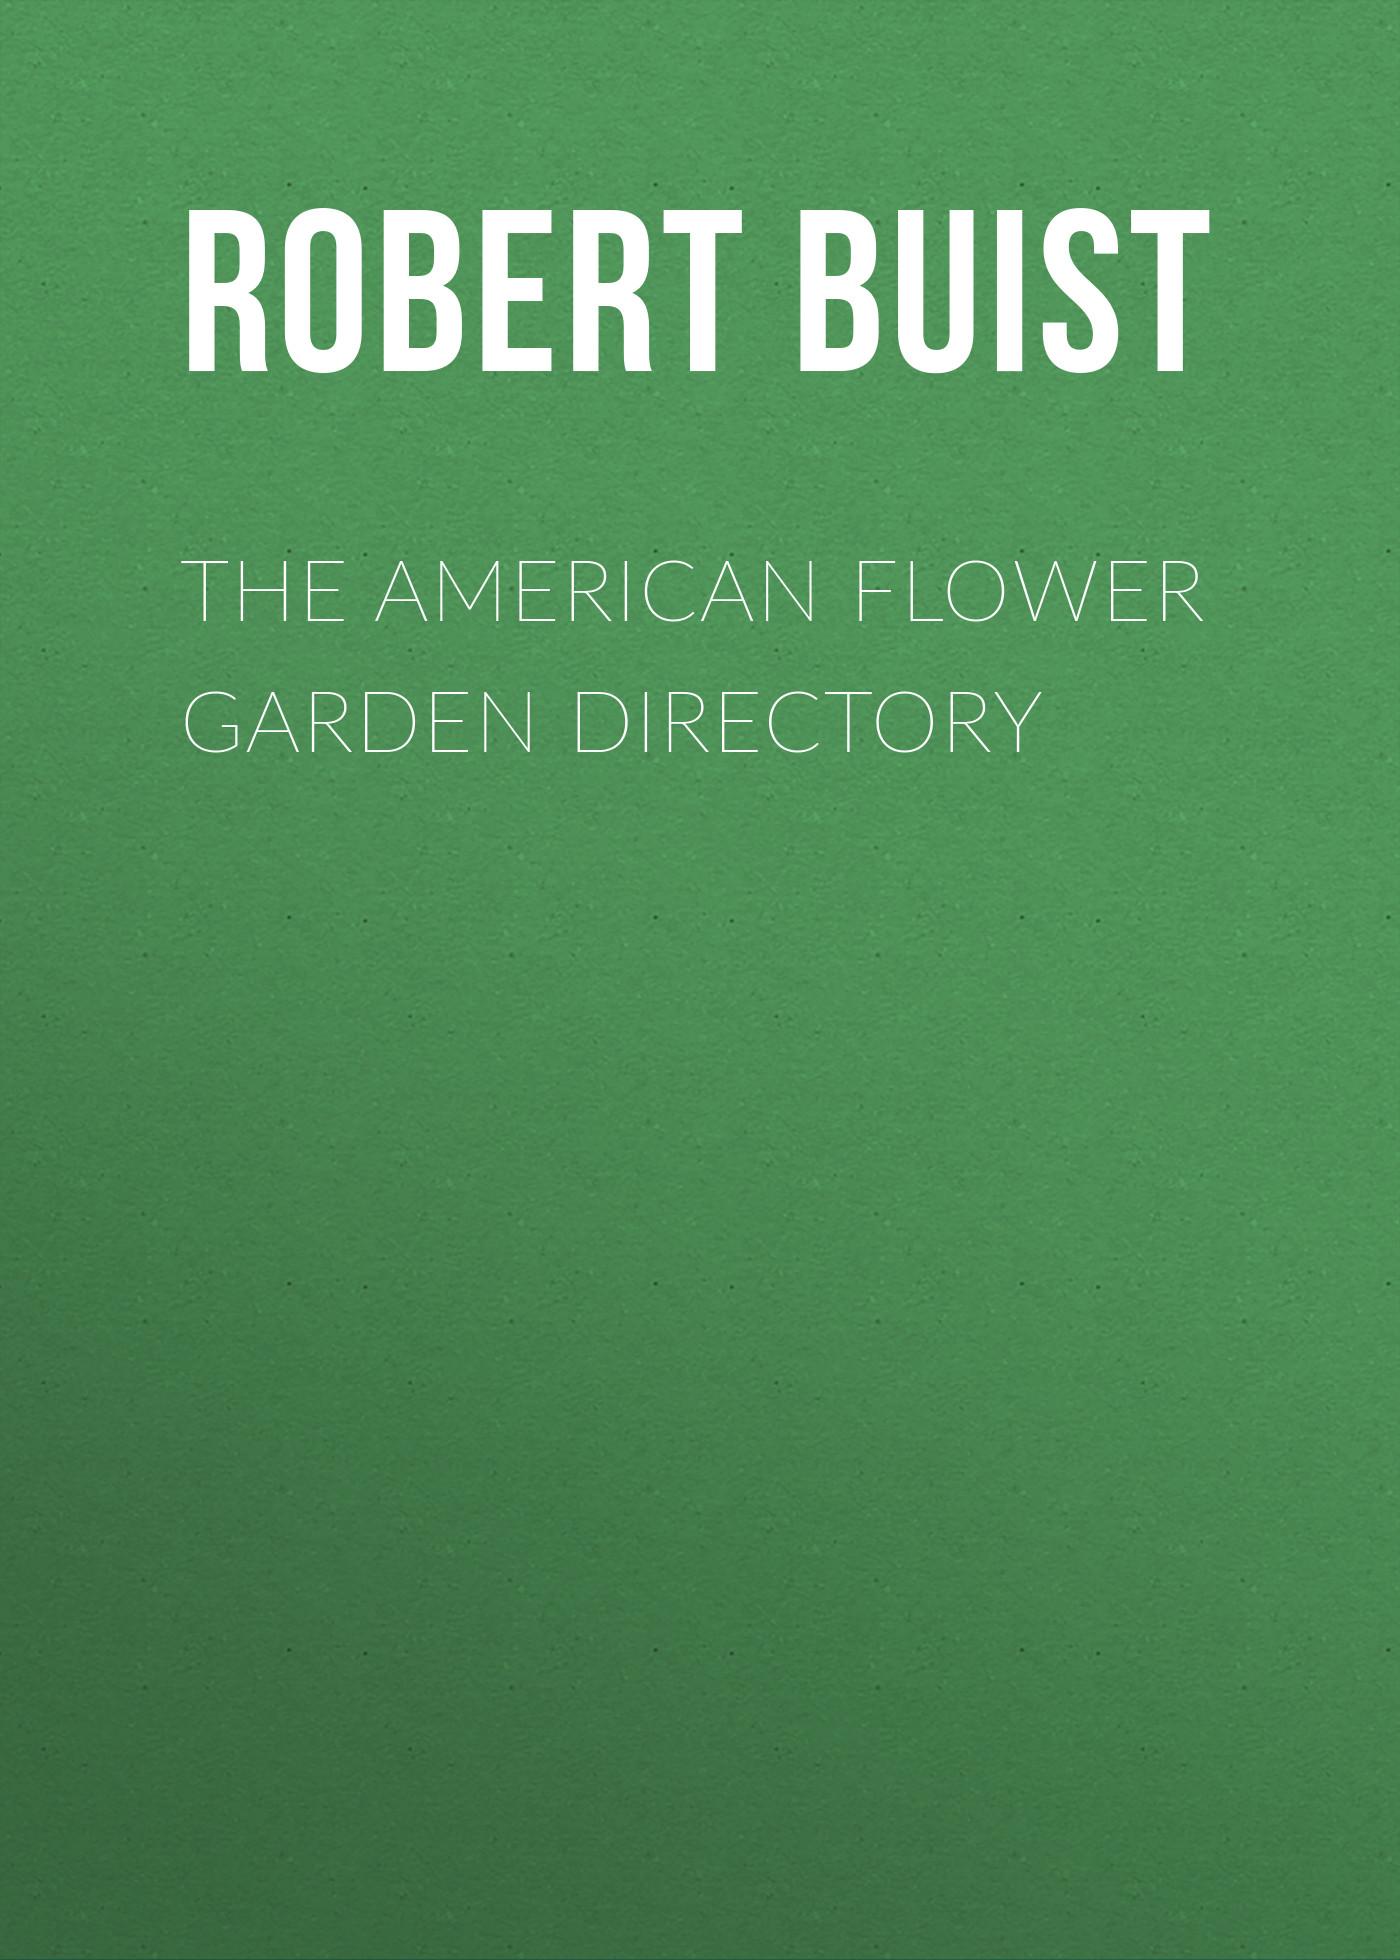 the american flower garden directory